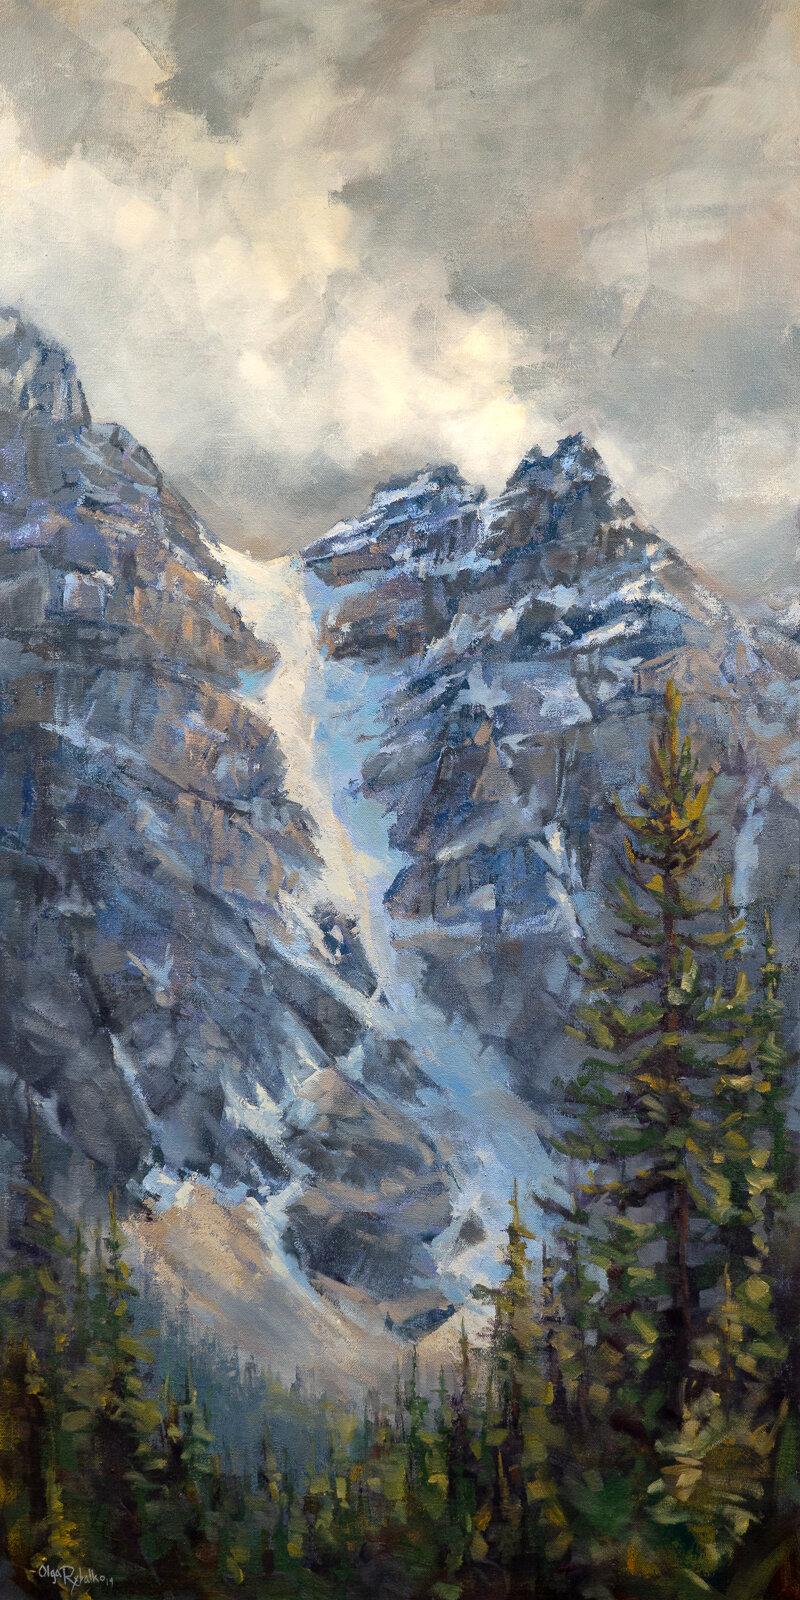 olga+rybalko+landscape+painting+banff+jasper+blue+altitudes.jpg